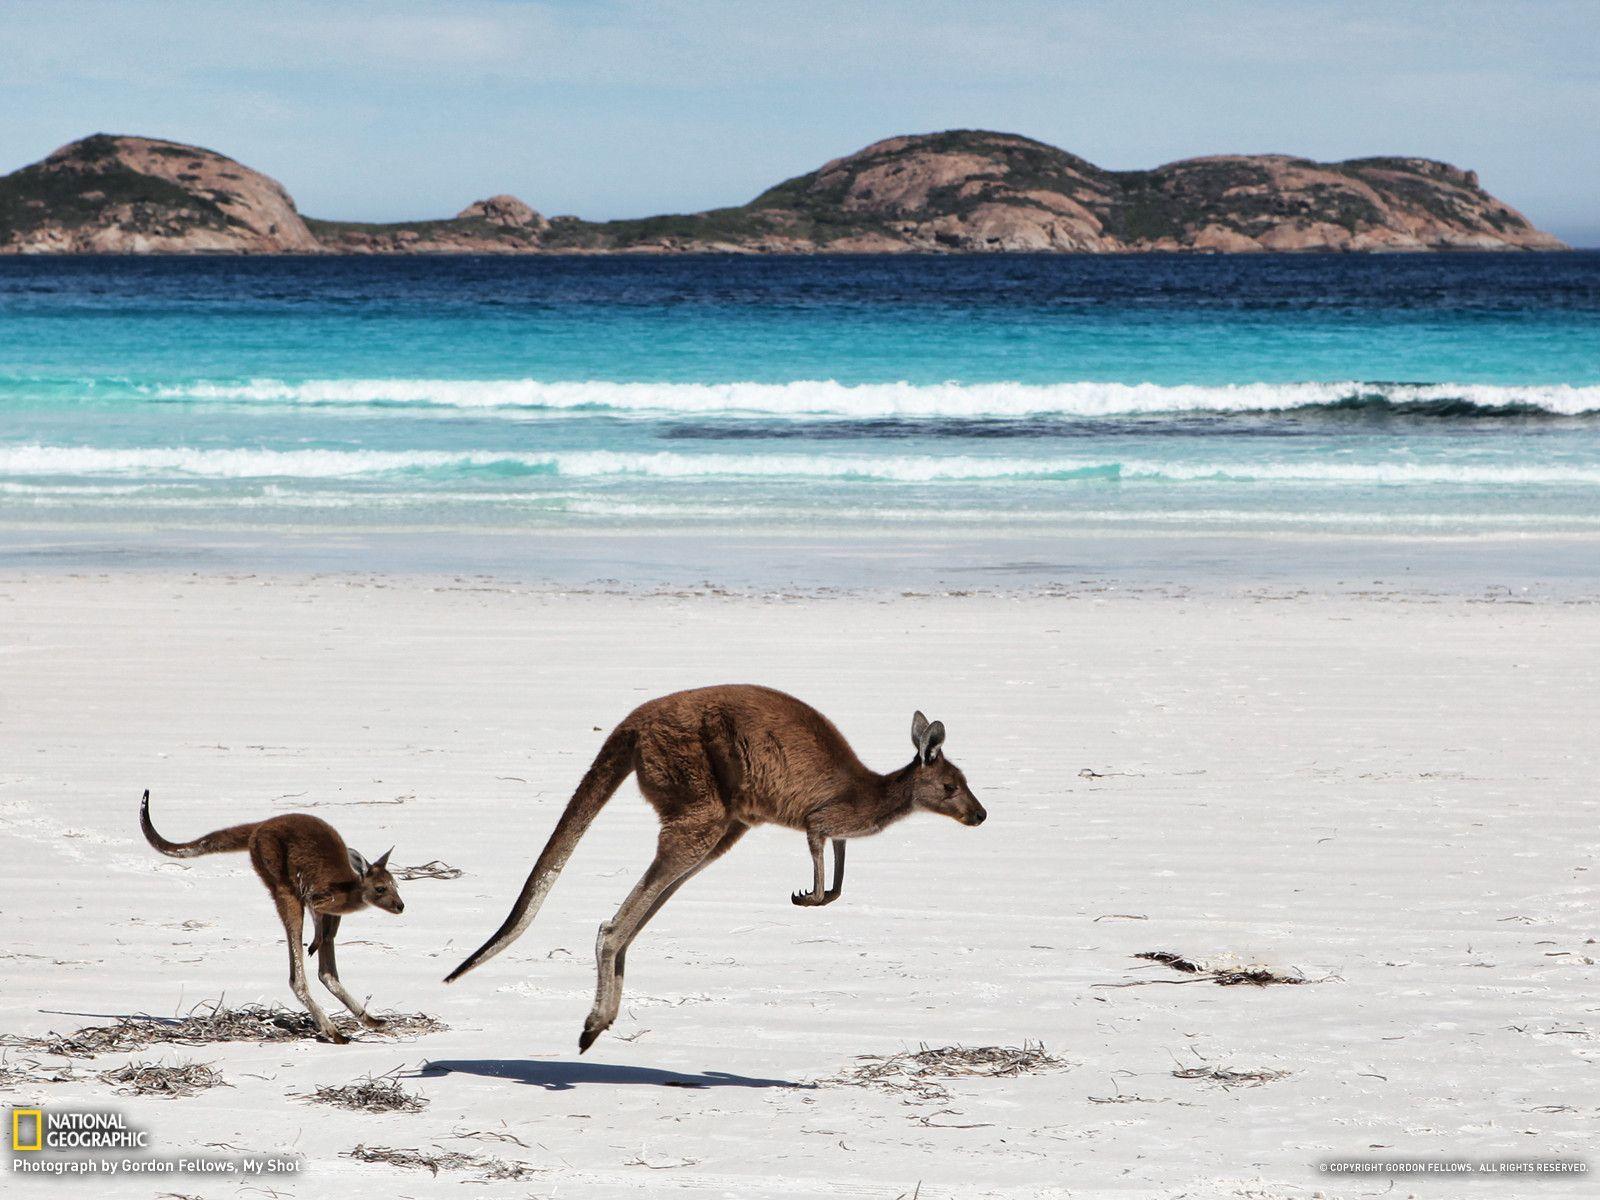 Kangaroo Picture -- Animal Wallpaper -- National Geographic Photo ...